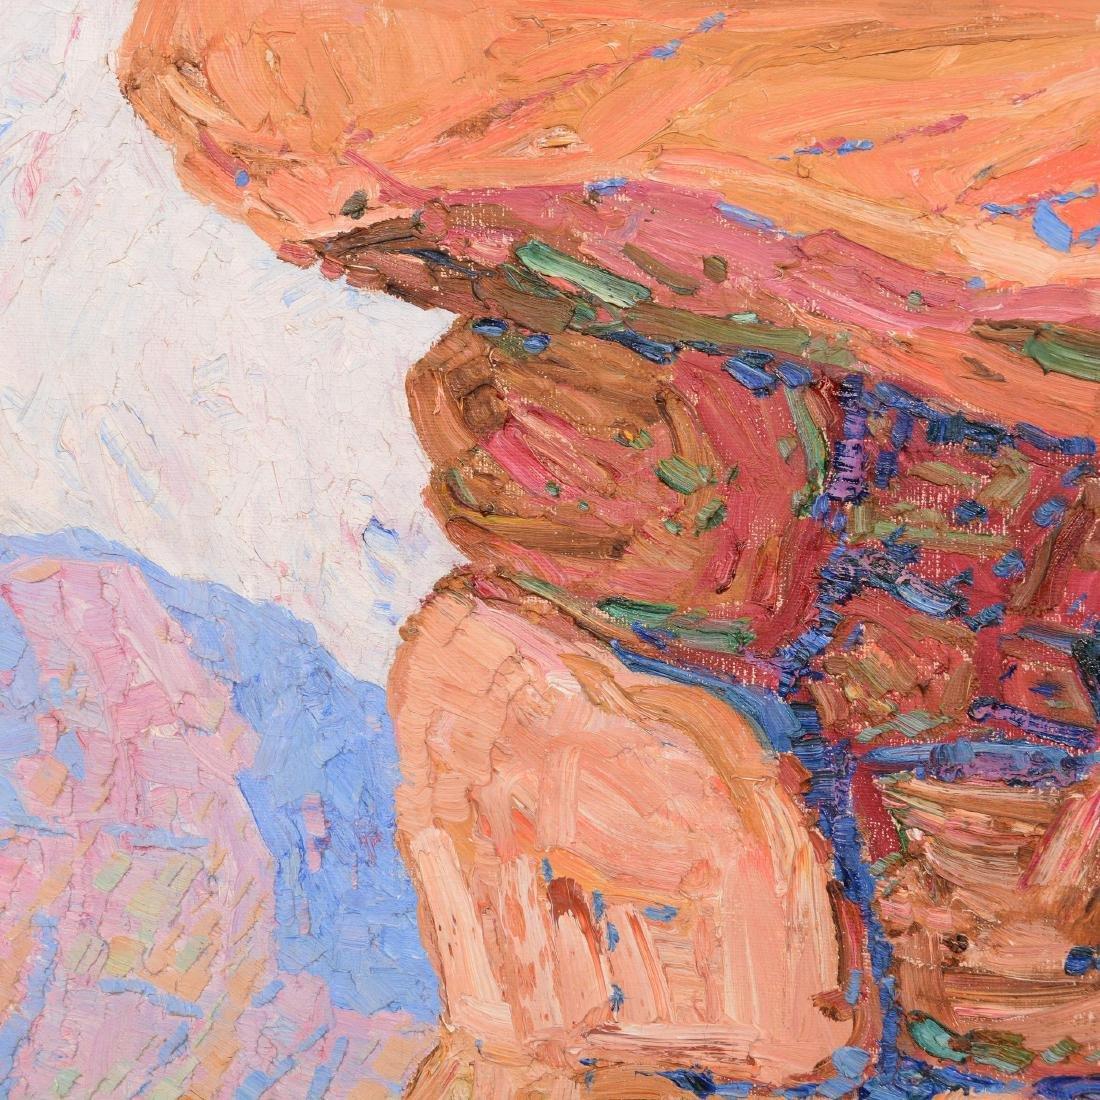 Original Birger Sandzen Oil Painting on Canvas - 3